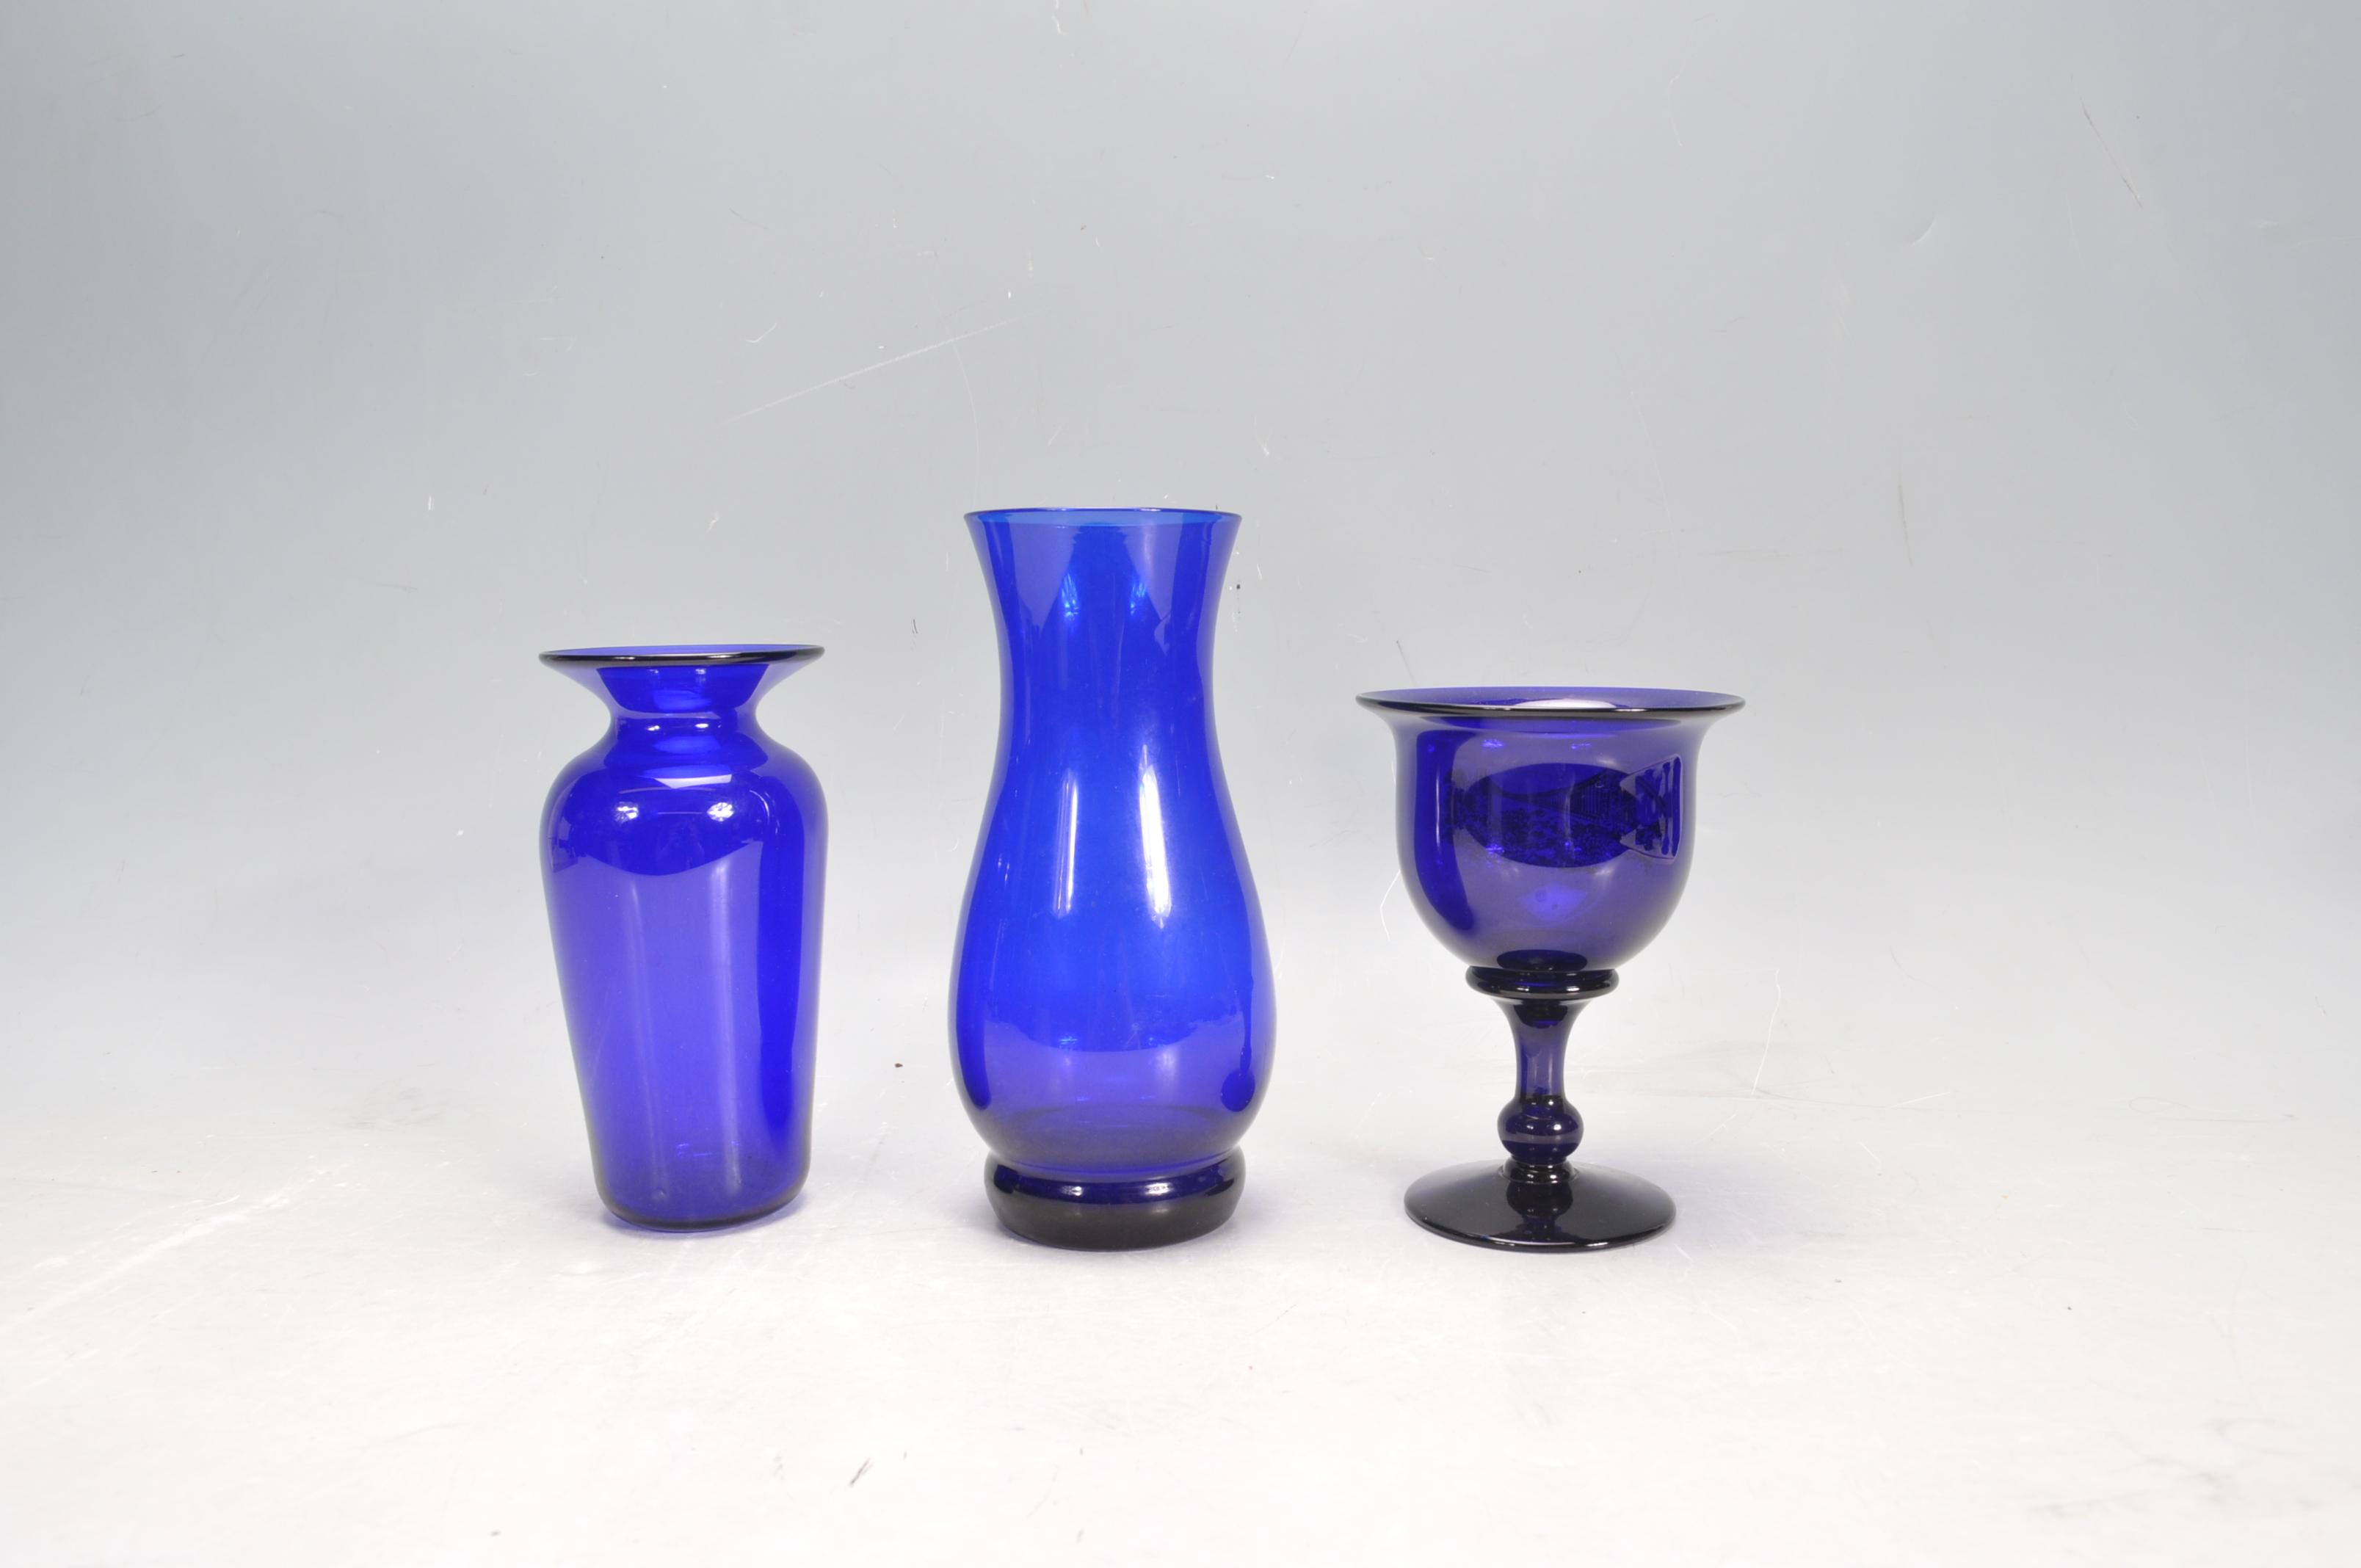 BRISTOL BLUE GLASS ORNAMENTS - Image 11 of 34